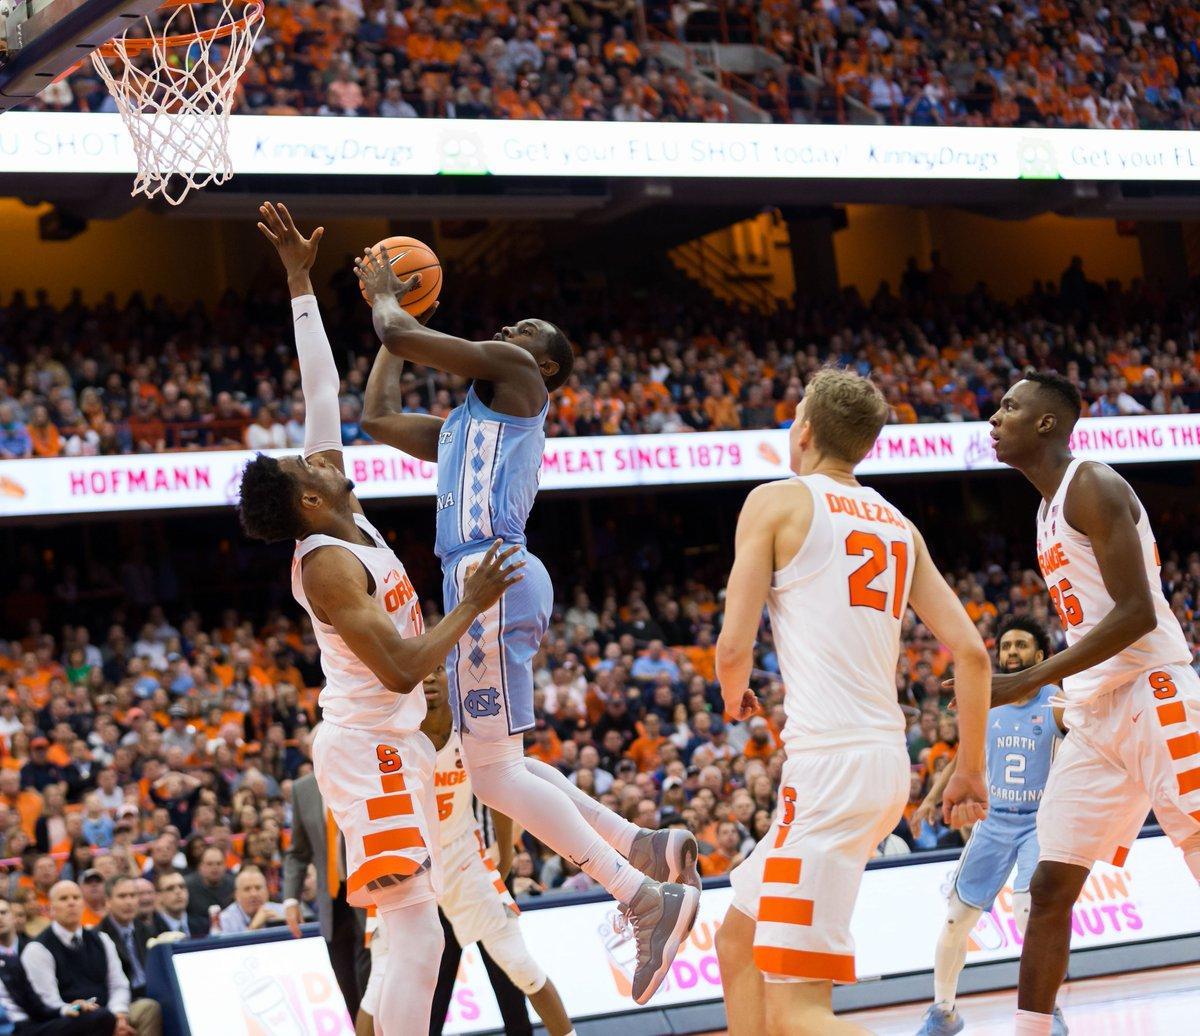 Photos from the win at Syracuse: https://t.co/YD8zHklhqC  #CarolinaSZN https://t.co/q5WWfflHjV